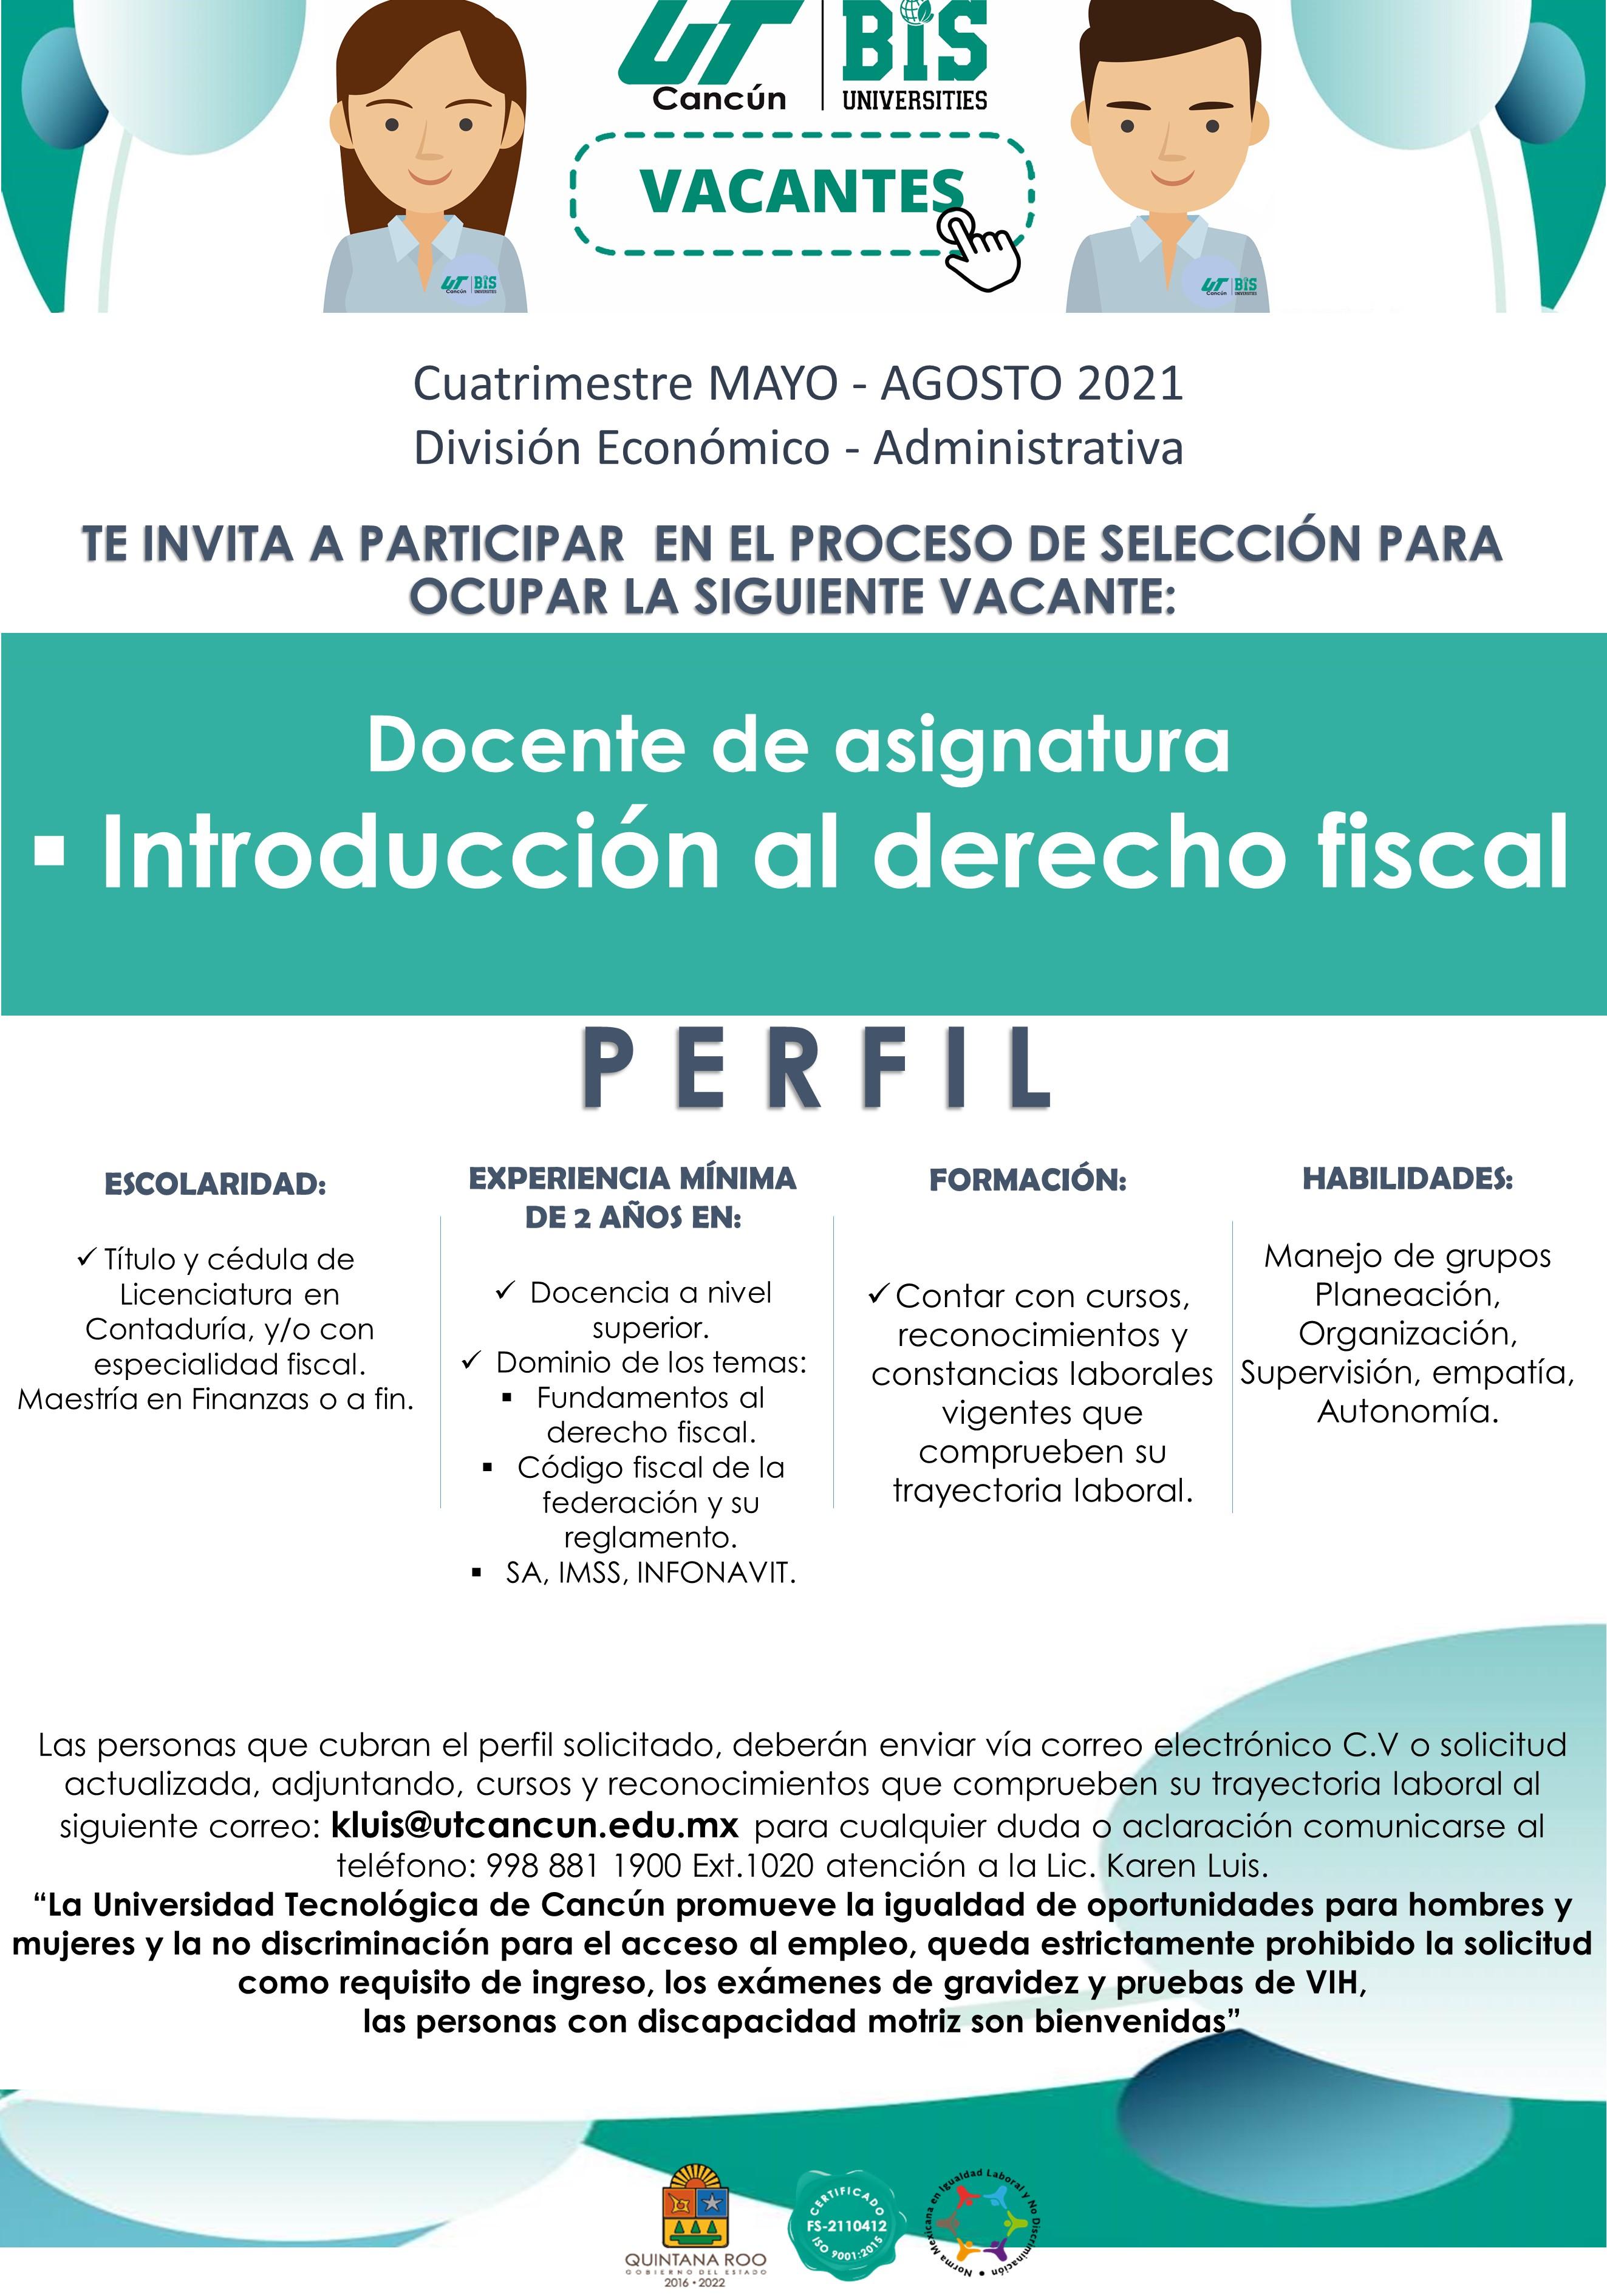 introducci%c2%a6n-al-derecho-fiscal